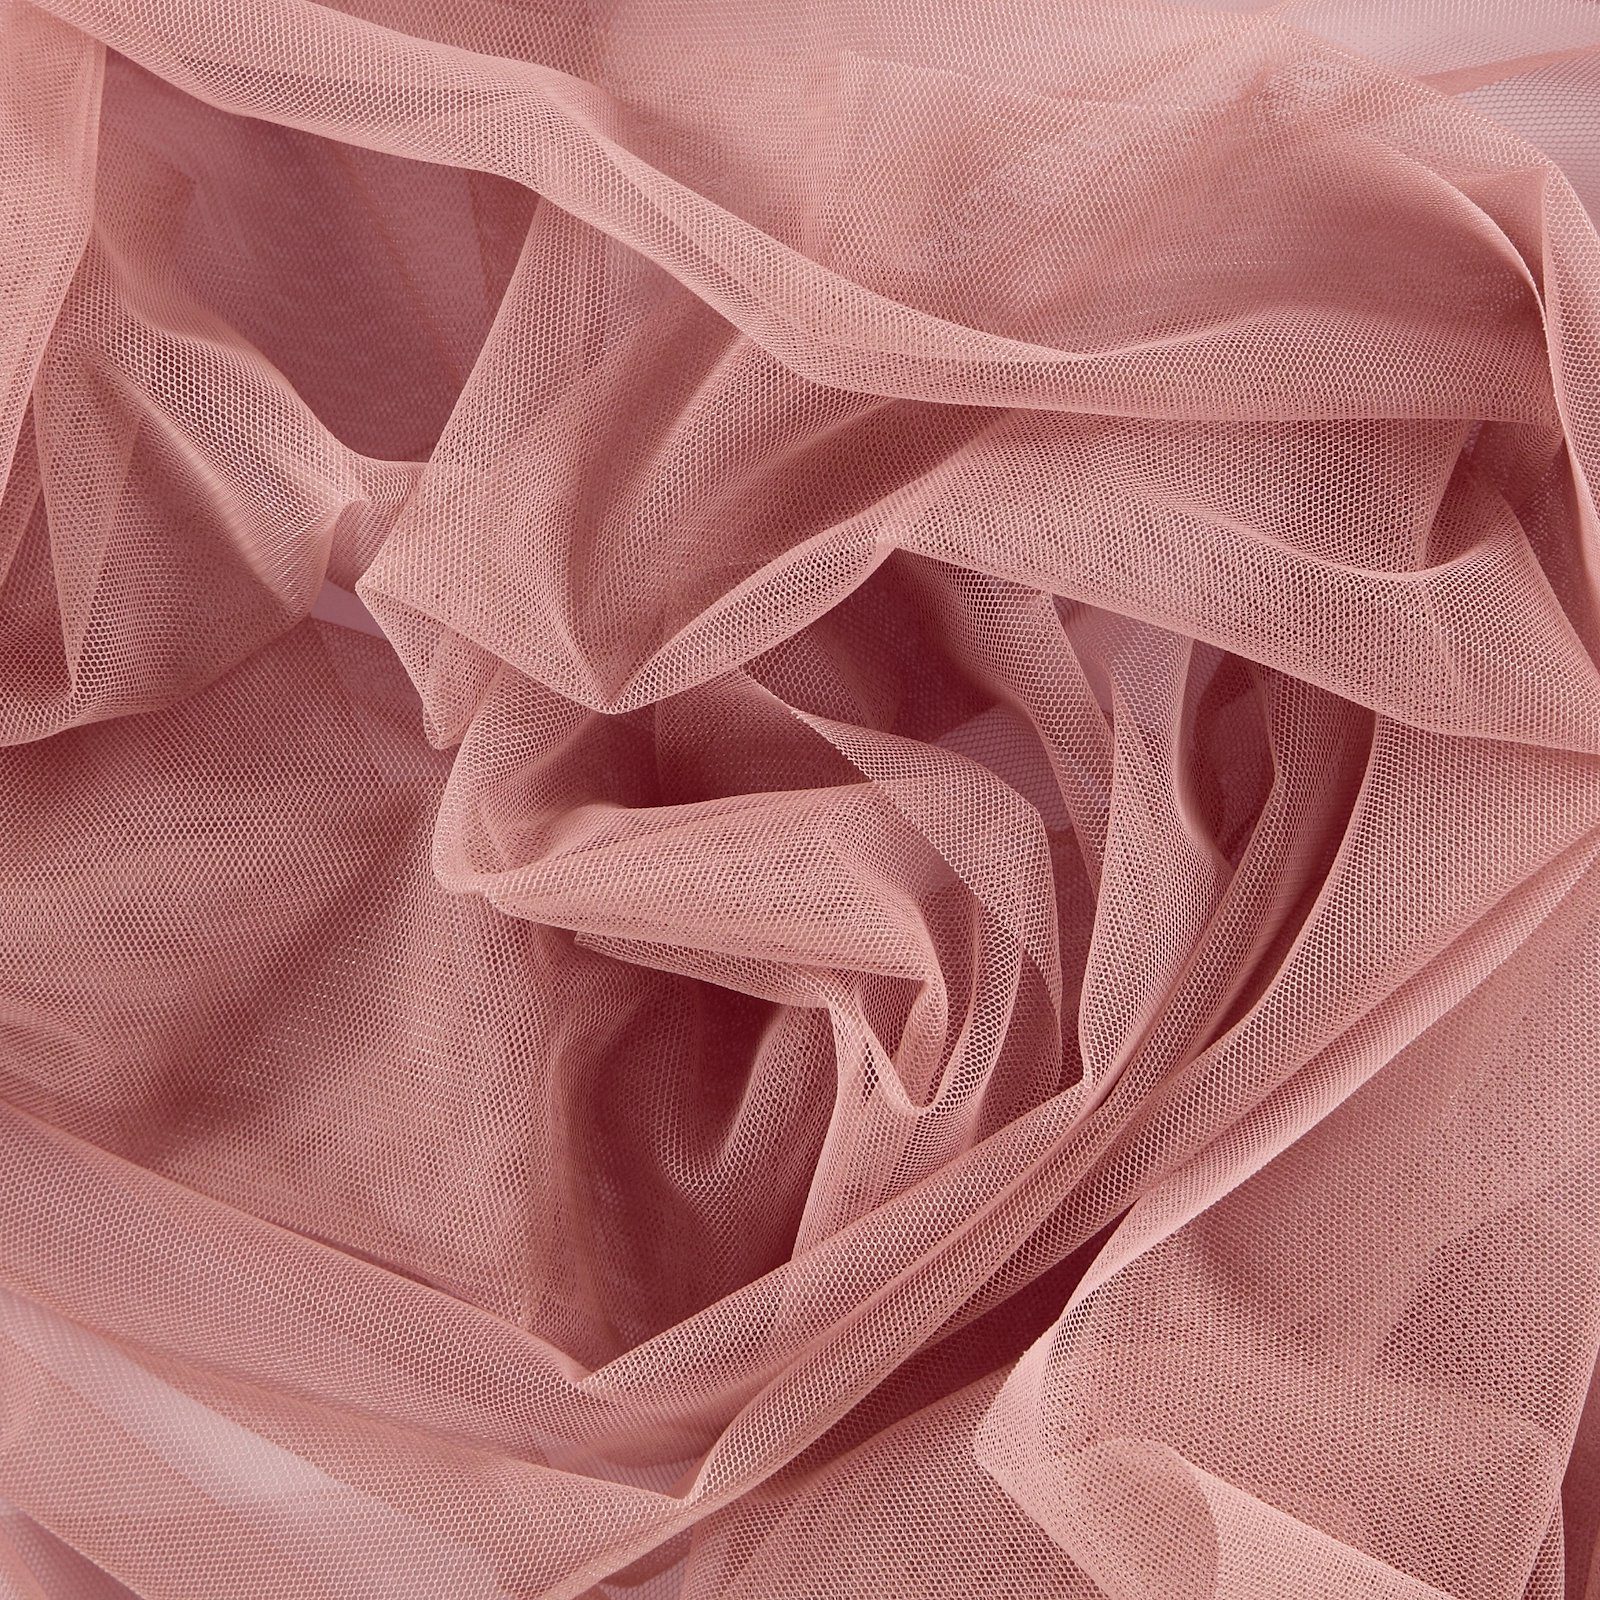 Soft tulle antique rose 640212_pack_solid